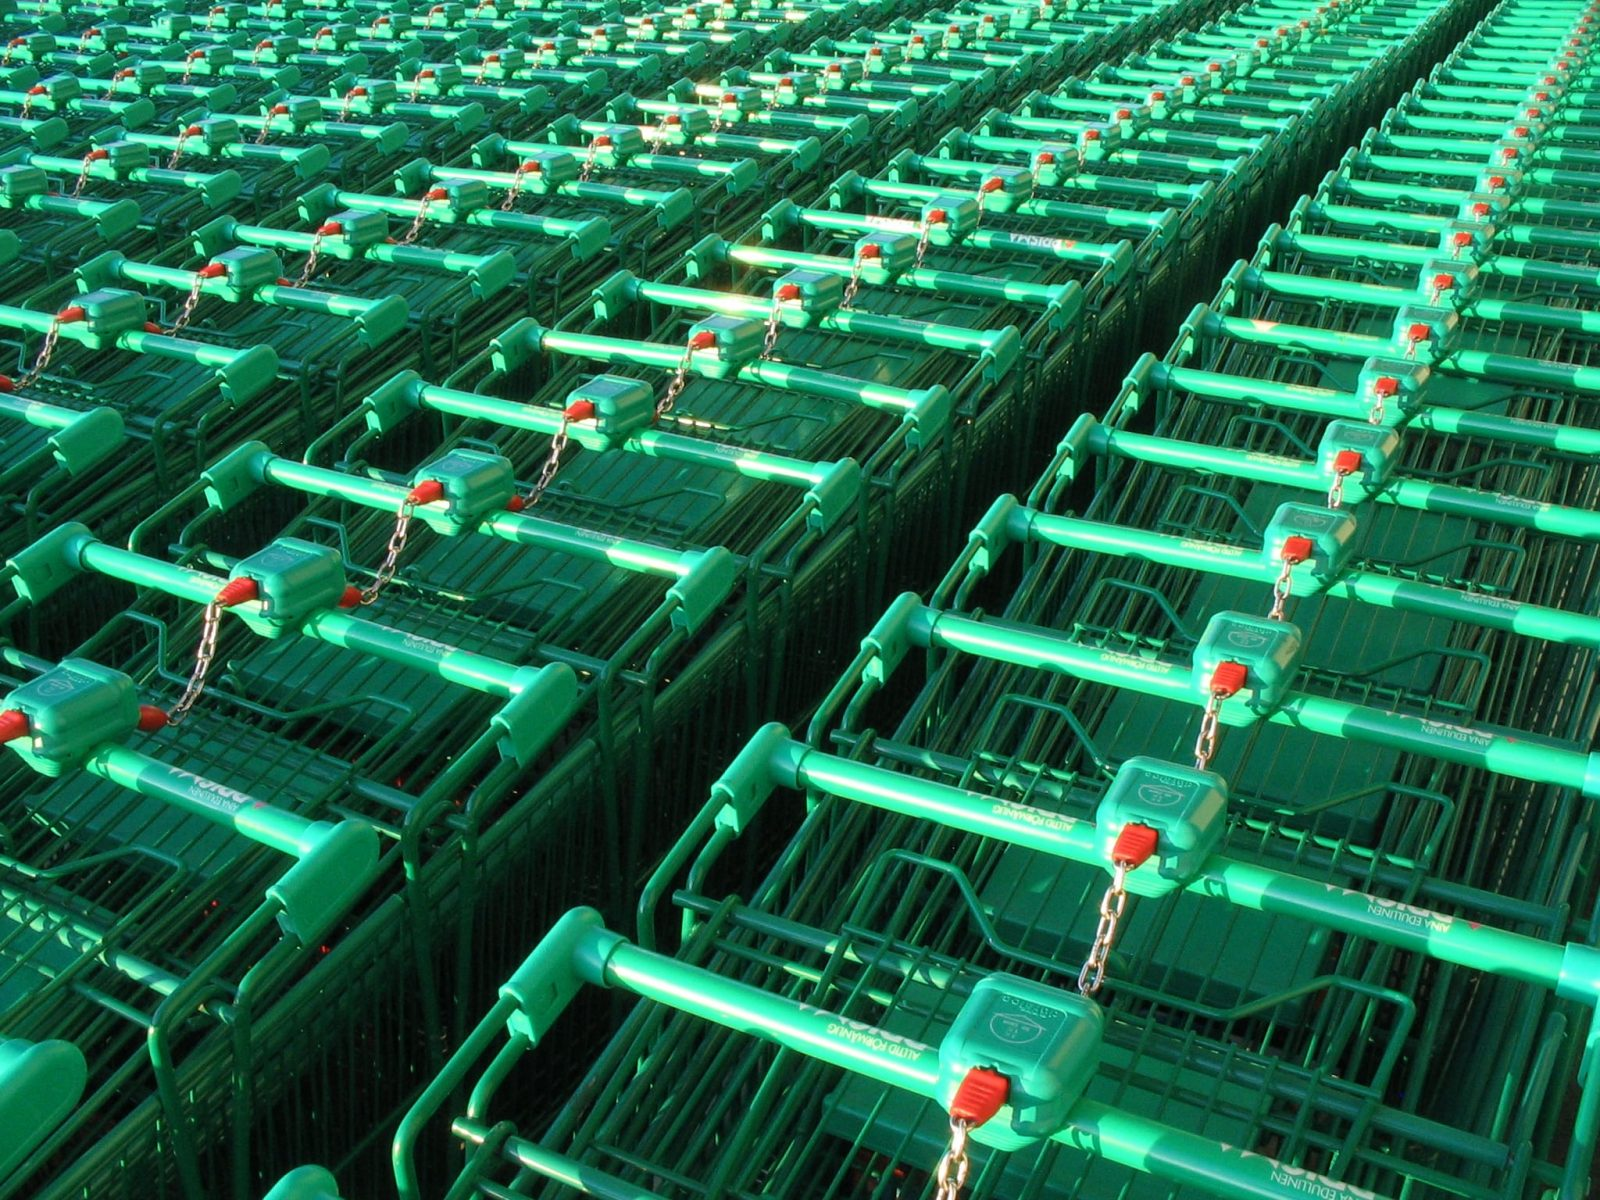 Feedback response to Sainsbury's and Asda merger